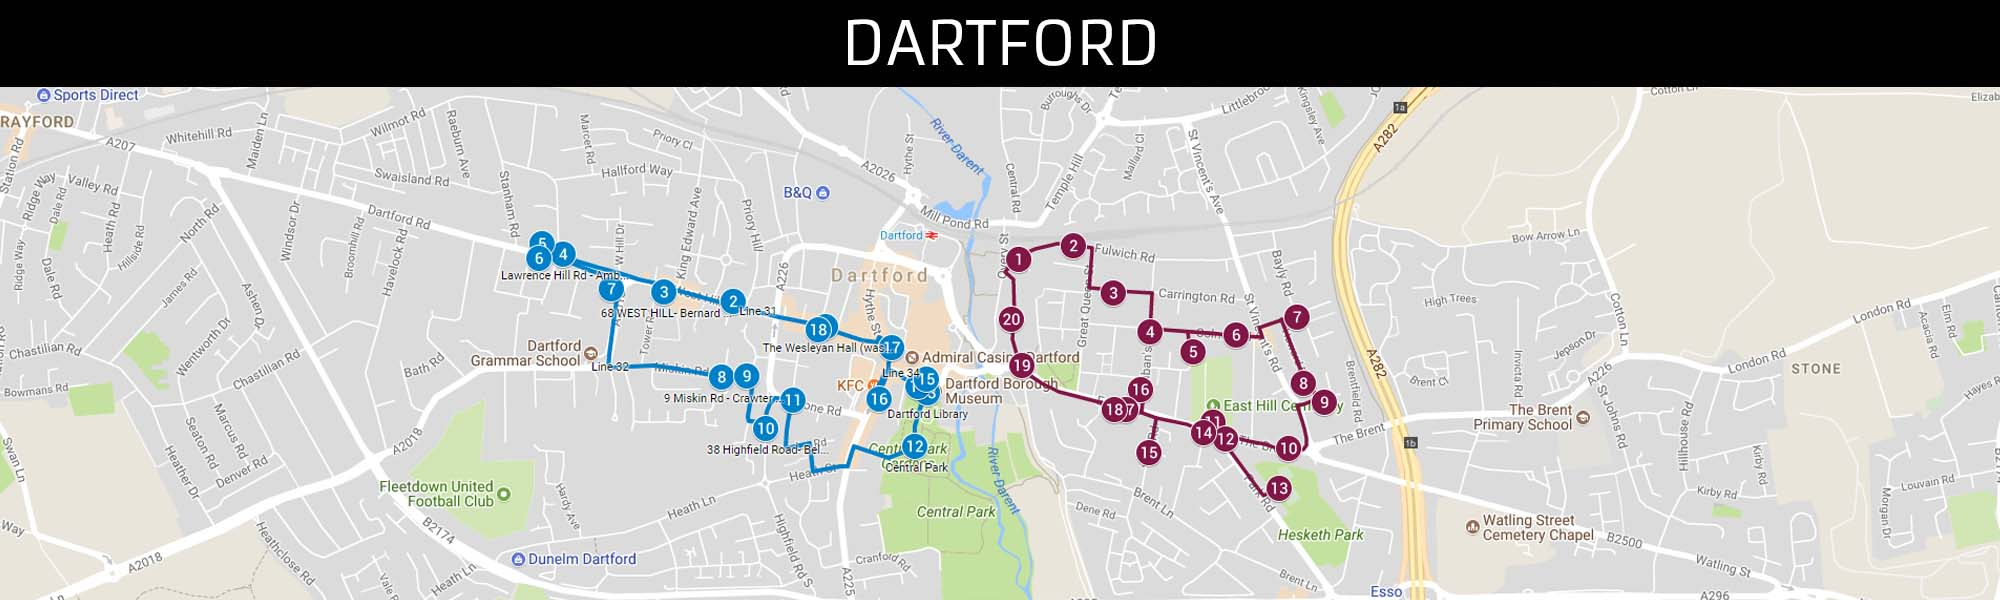 Dartford Trail